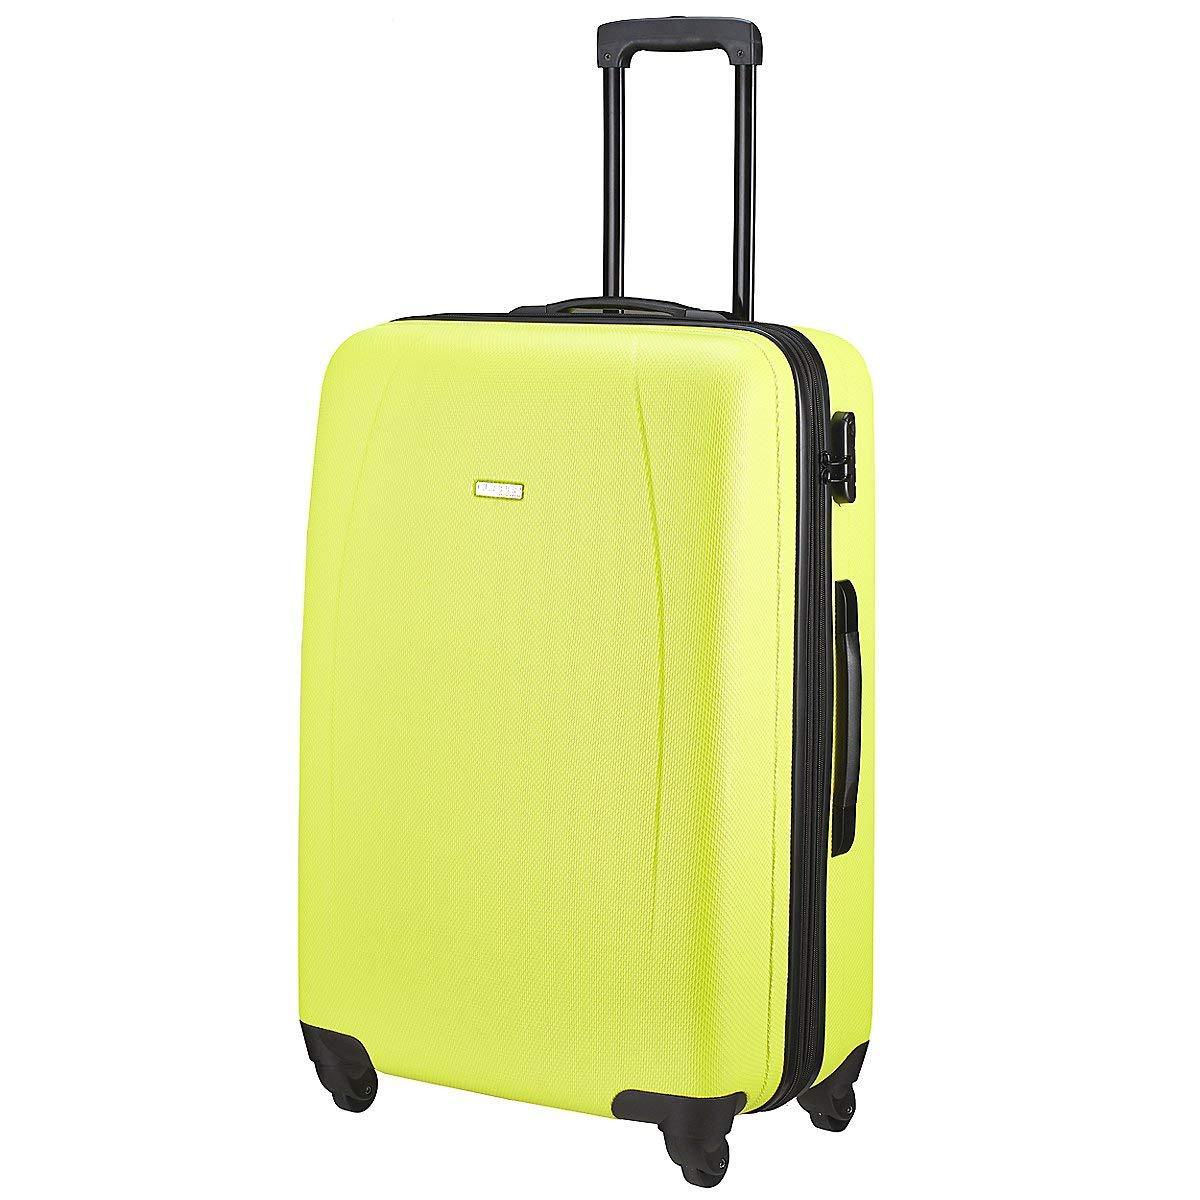 Pack Easy - Maleta, Lemon (Verde) - 310-l-ge: Amazon.es: Equipaje